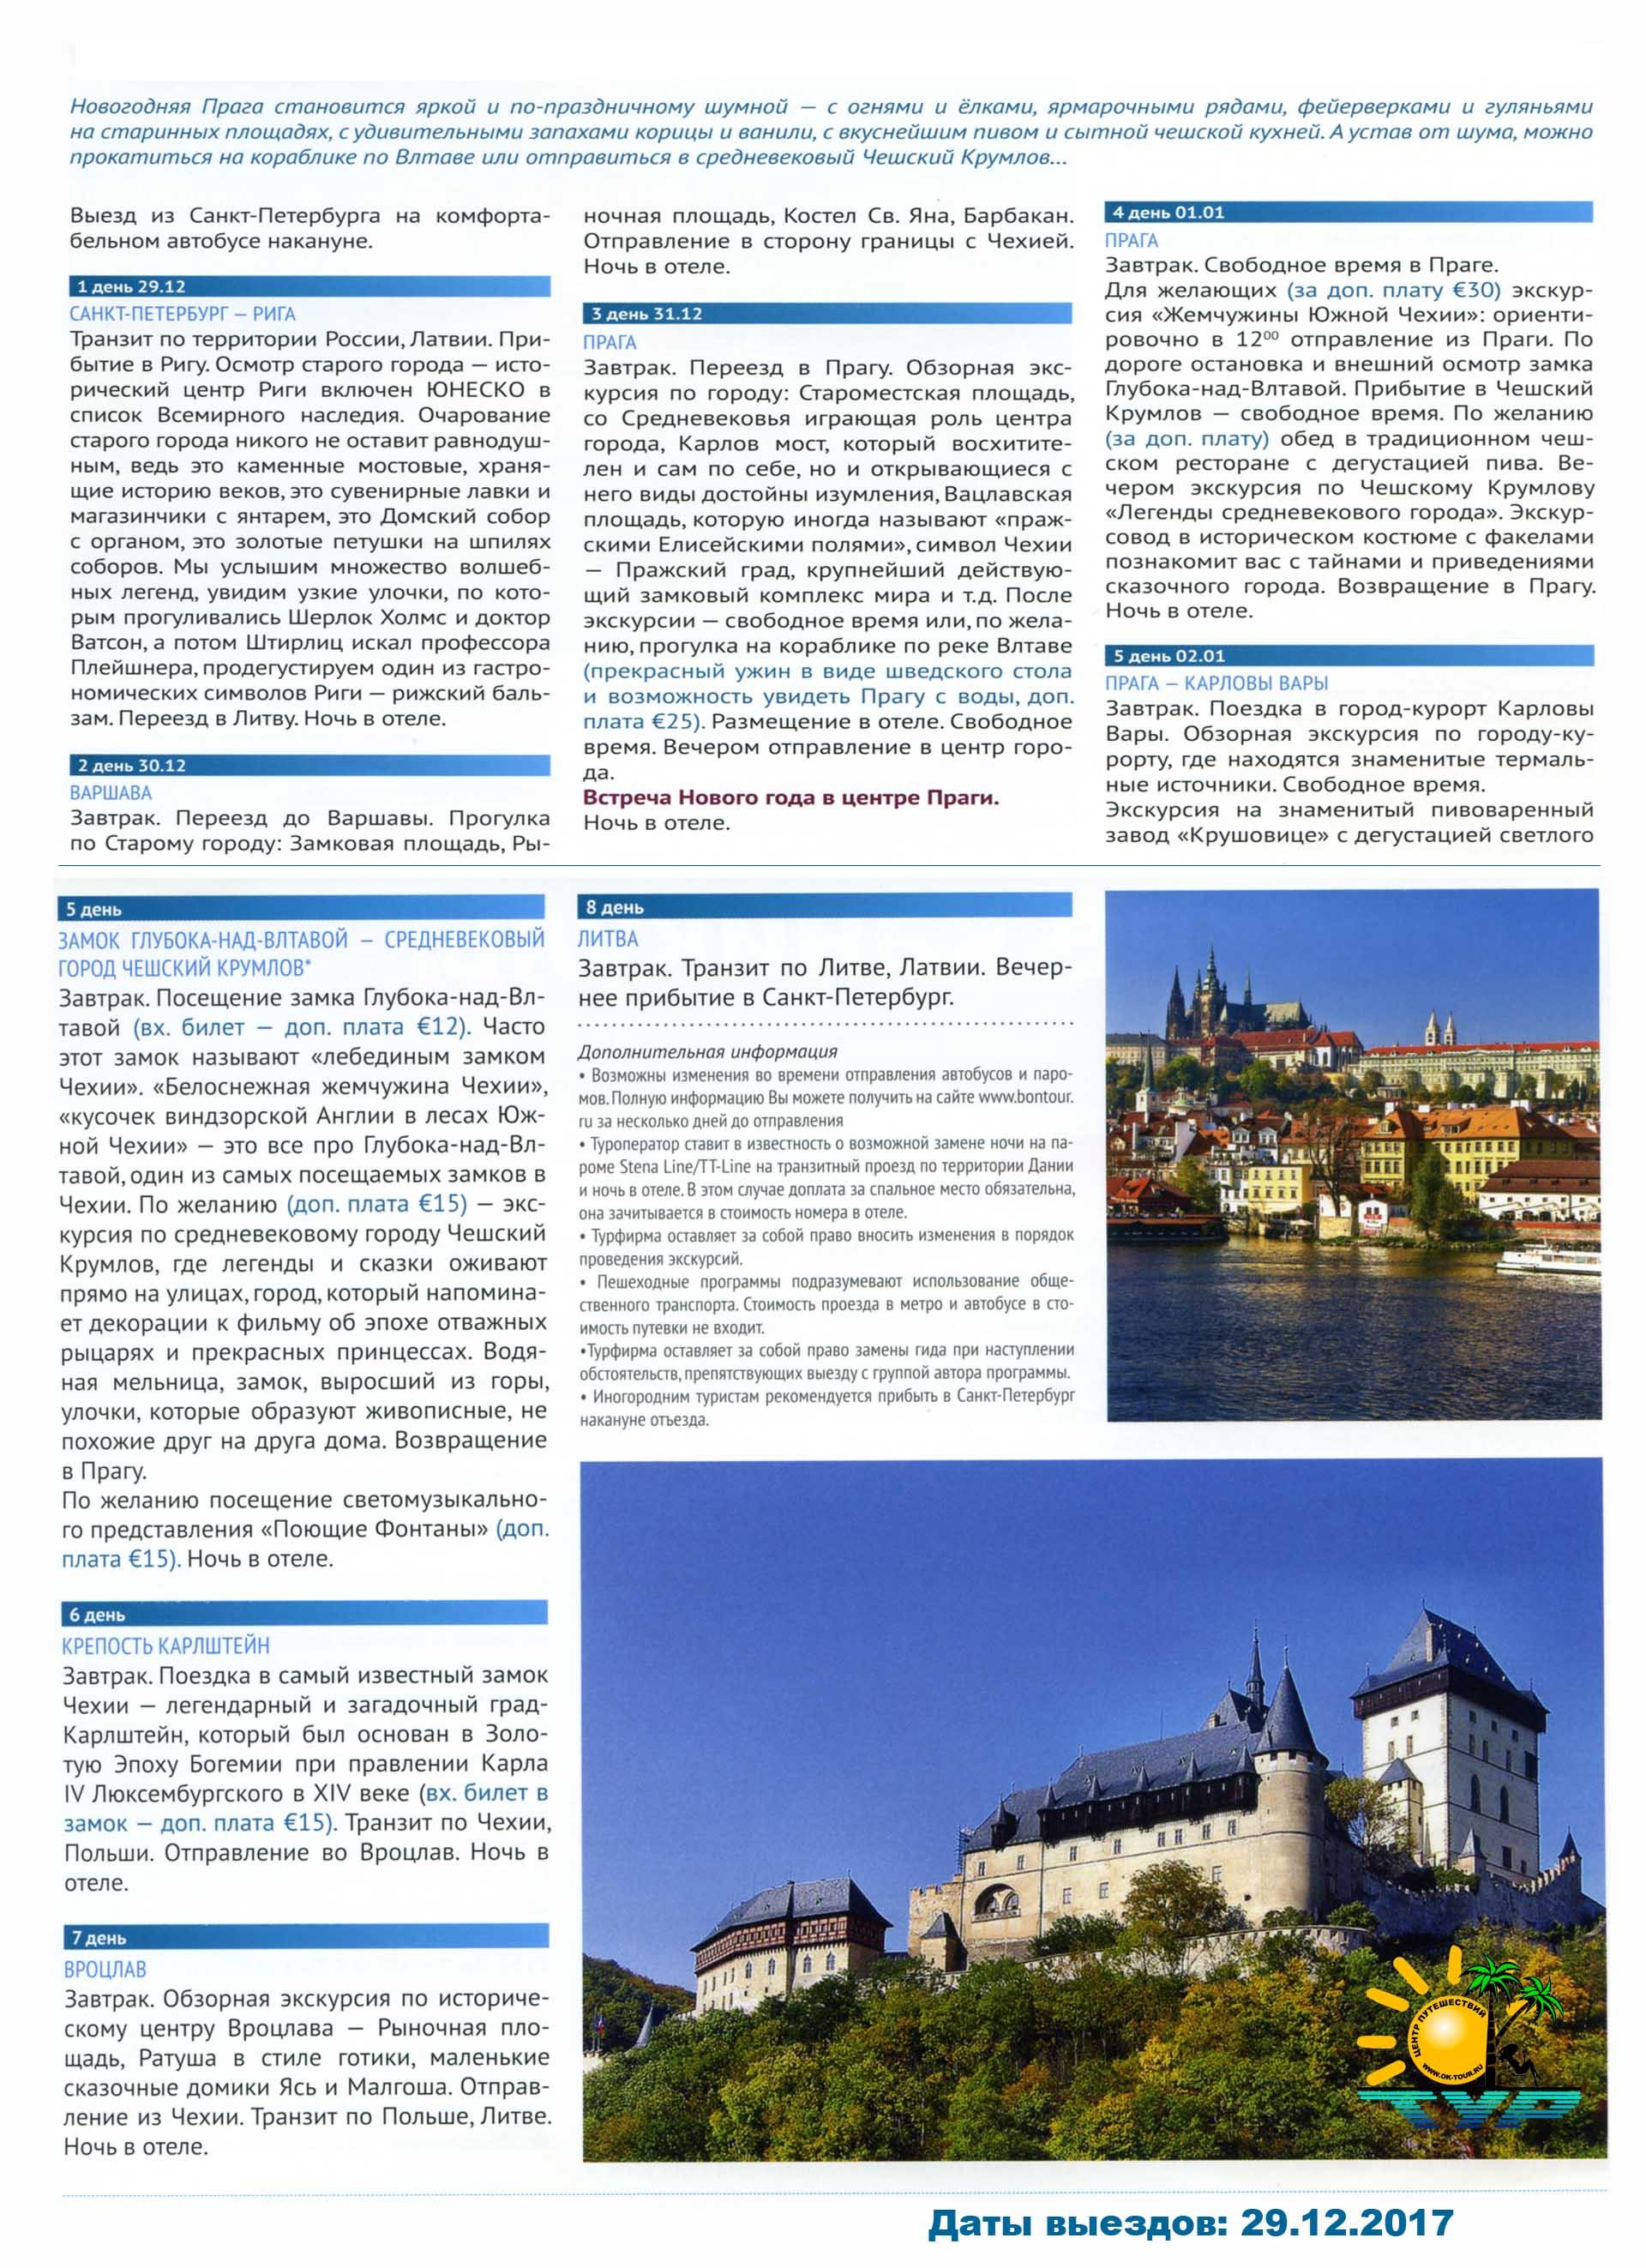 Новогодний тур в Чехию из СПб